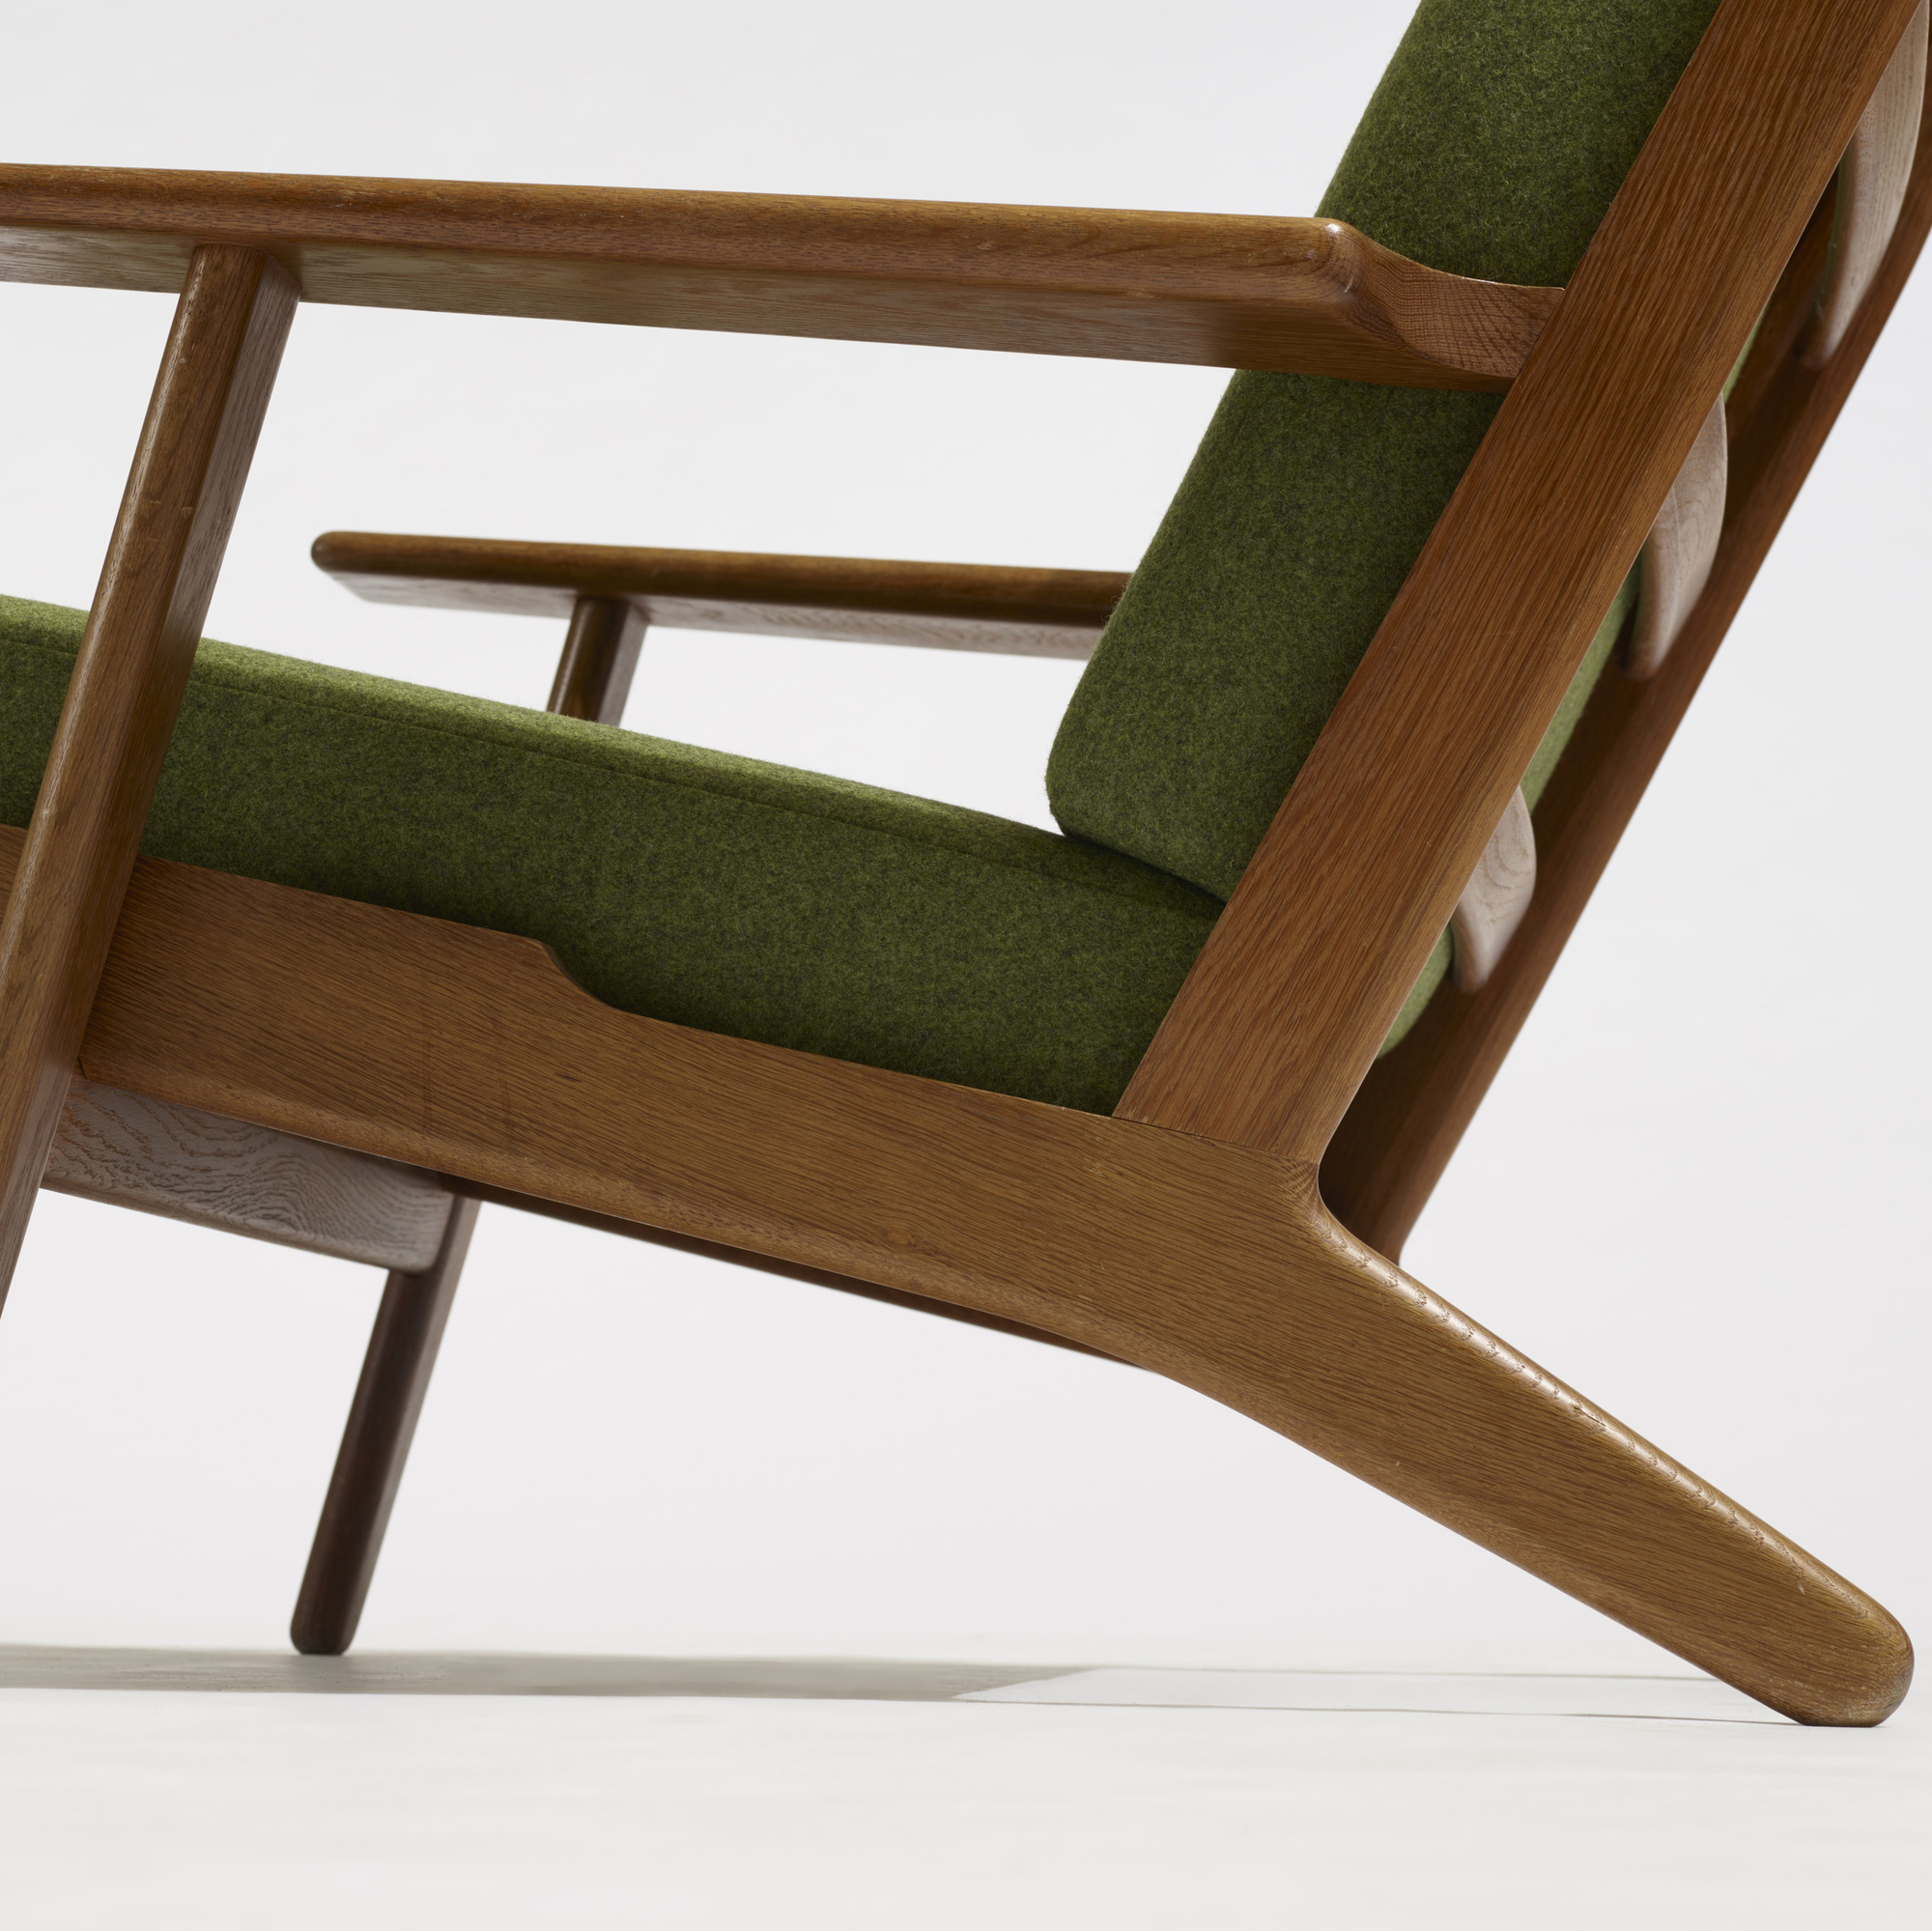 ... 206: Hans J. Wegner / Lounge Chair, Model GE290 A (3